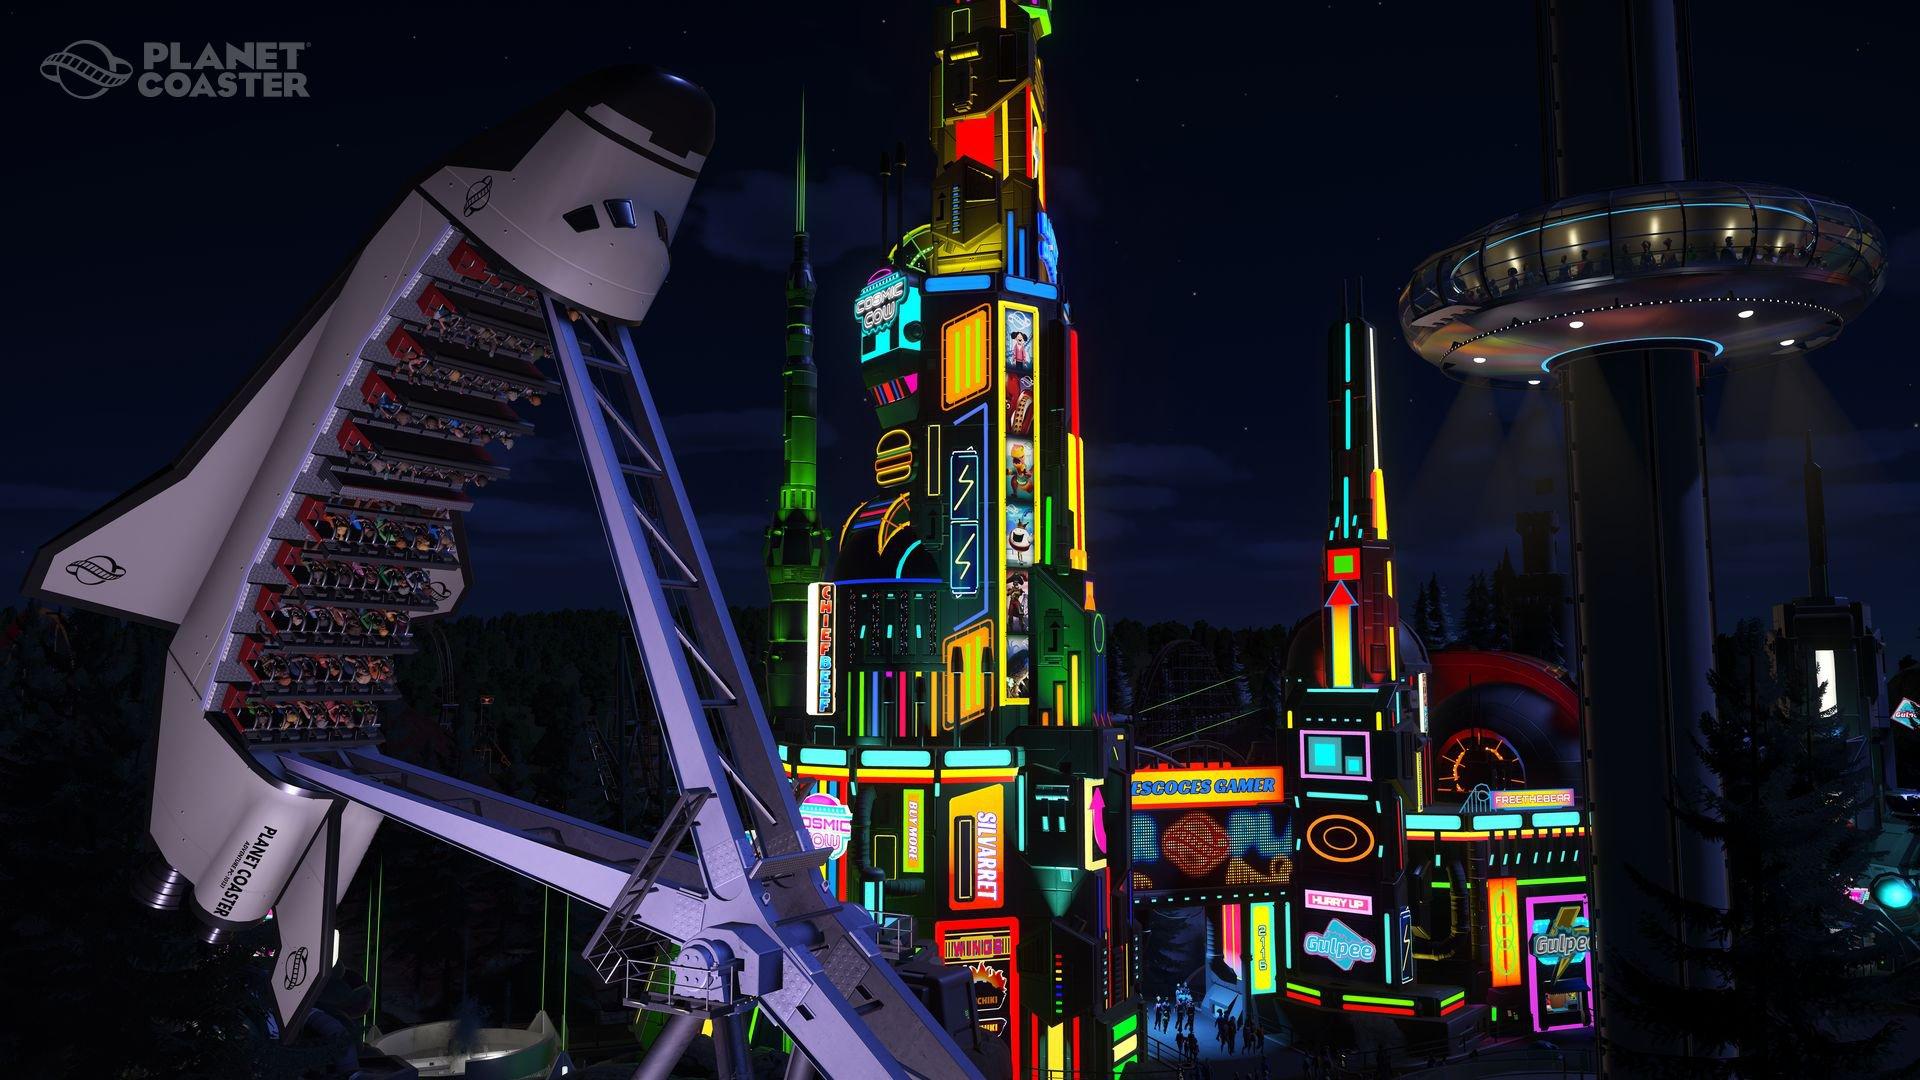 Planet Coaster 11